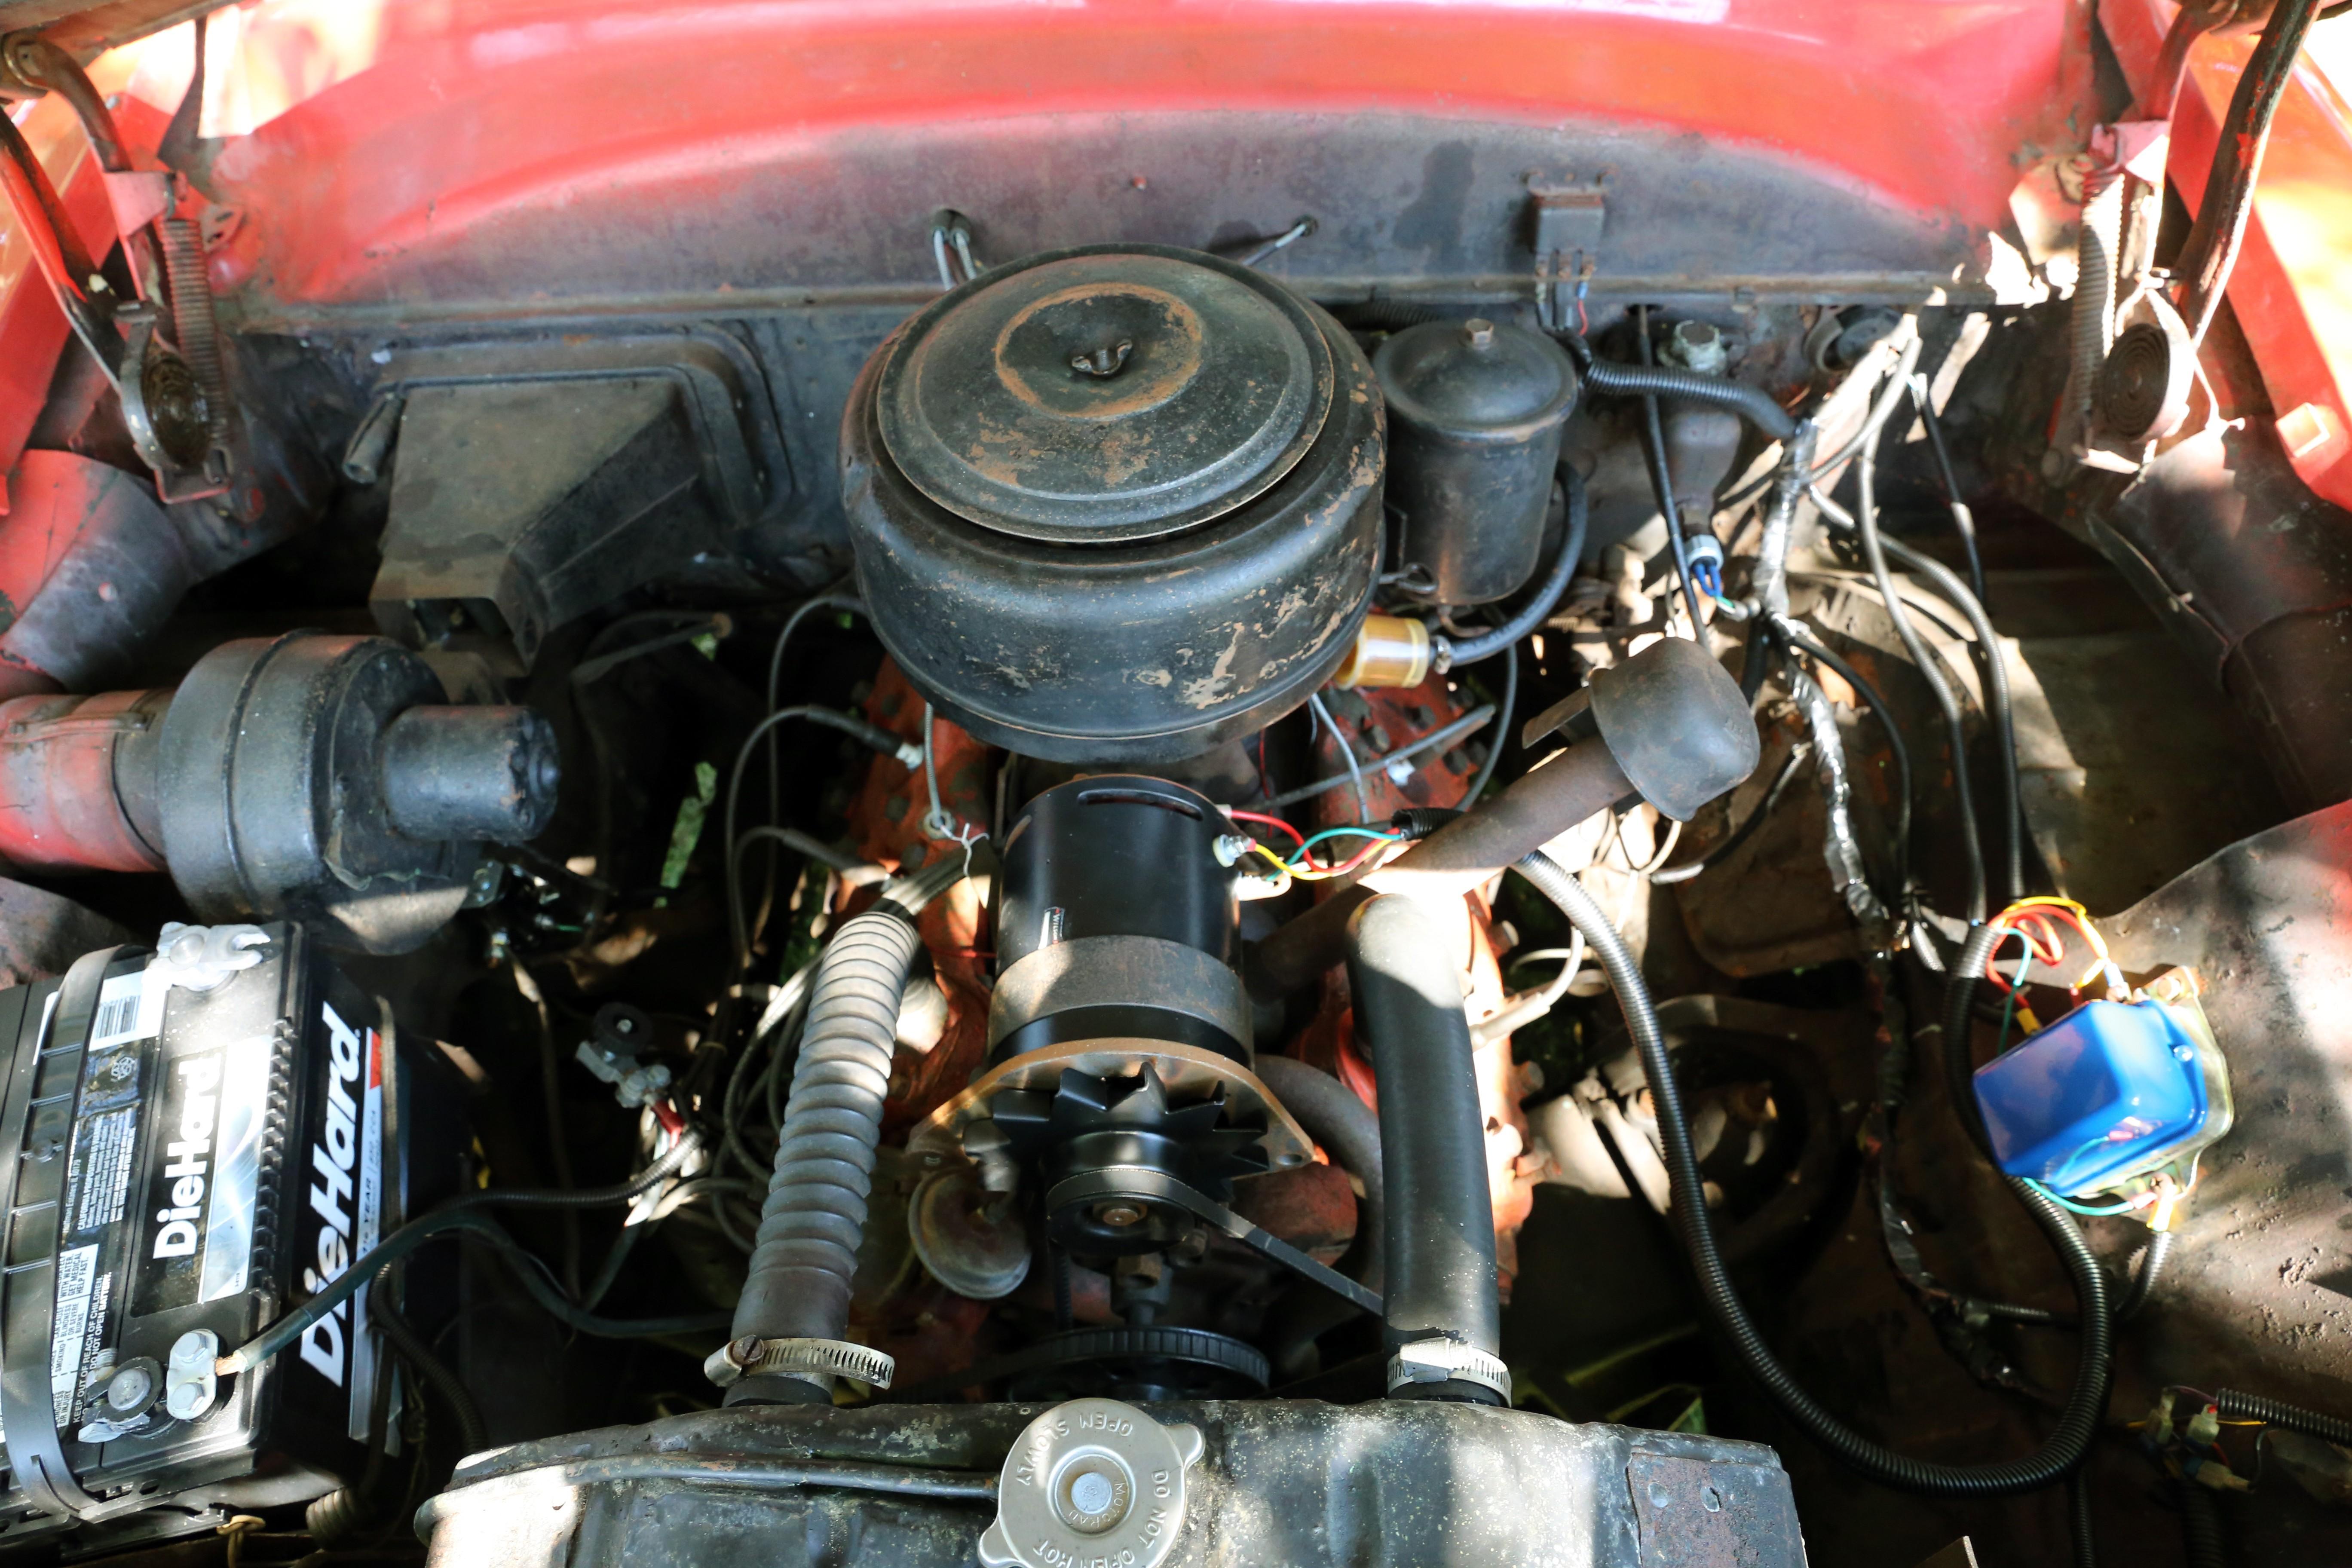 Flathead Engine Diagram File 1953 ford V8 B3 Flathead Sunliner Wikimedia Mons Of Flathead Engine Diagram